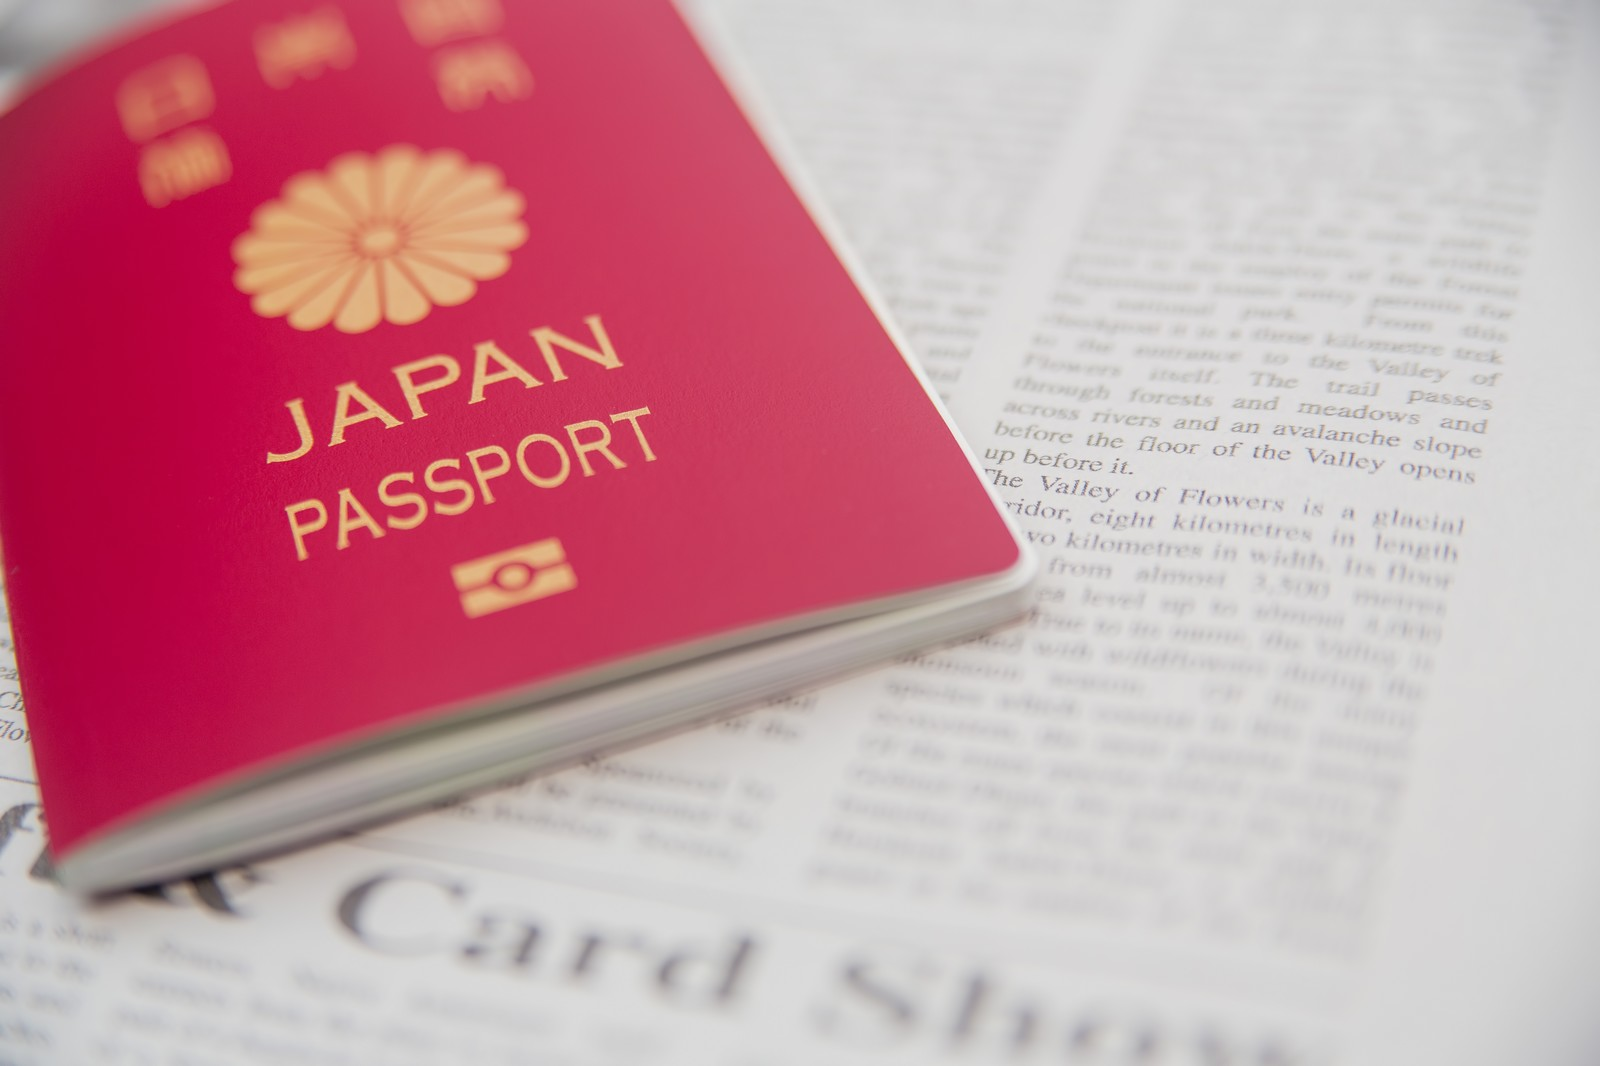 MS251_japanpassport_TP_V